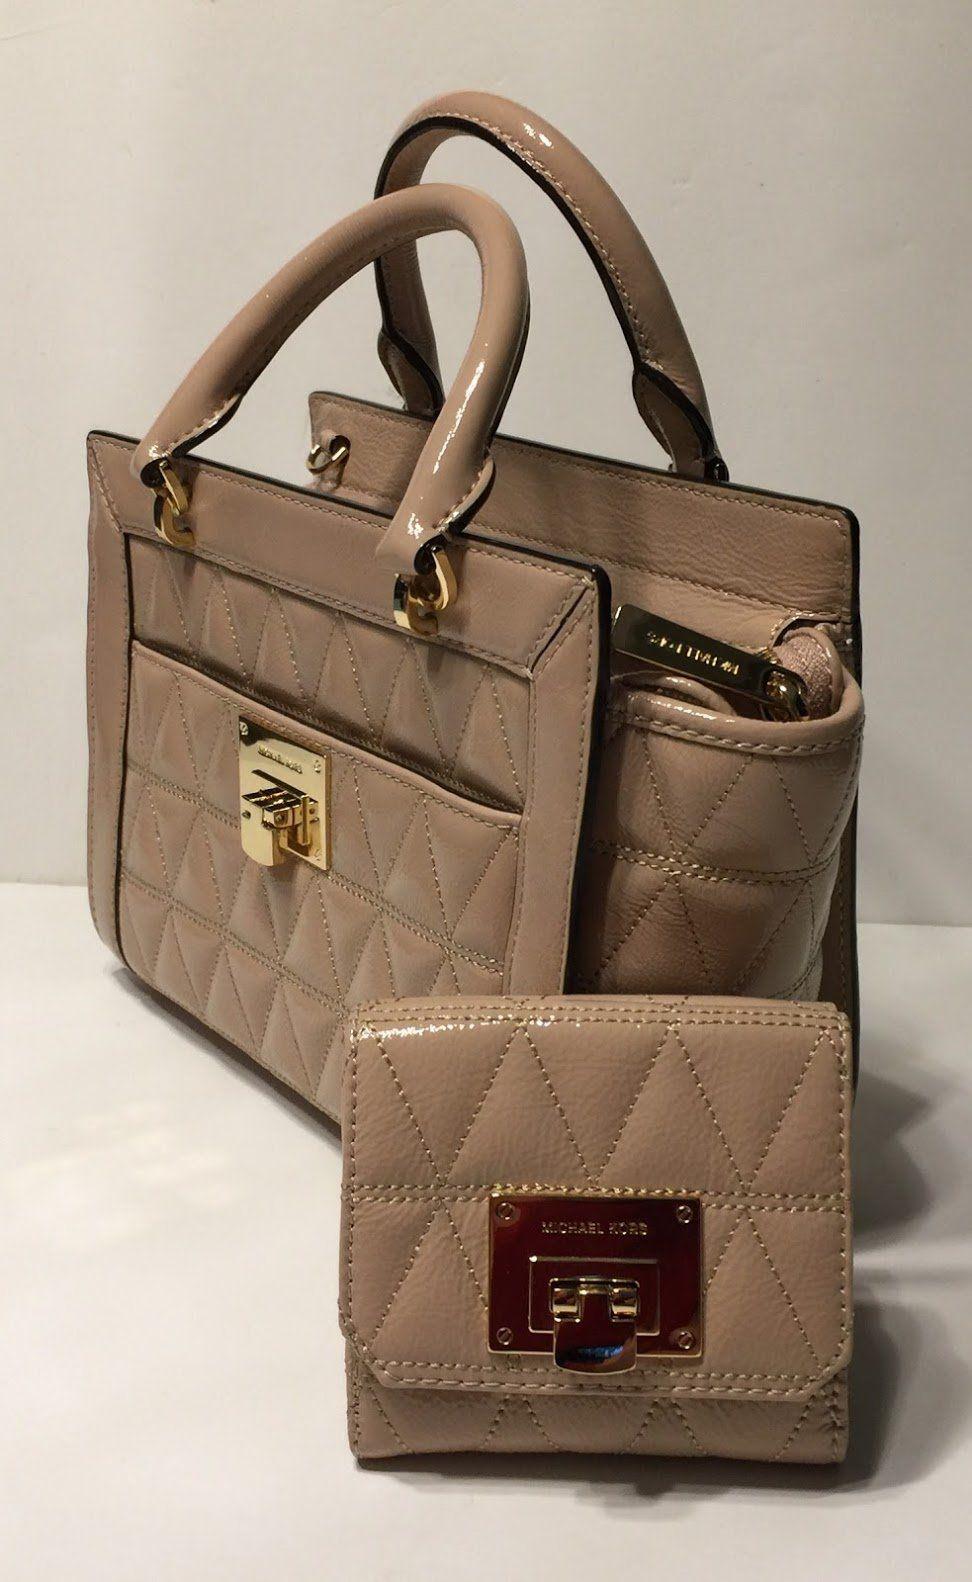 56bb19714c MICHAEL Michael Kors Vivianne SM TZ Messenger Quilted Handbag bundled with  Michael Kors Vivianne Trifold Wallet